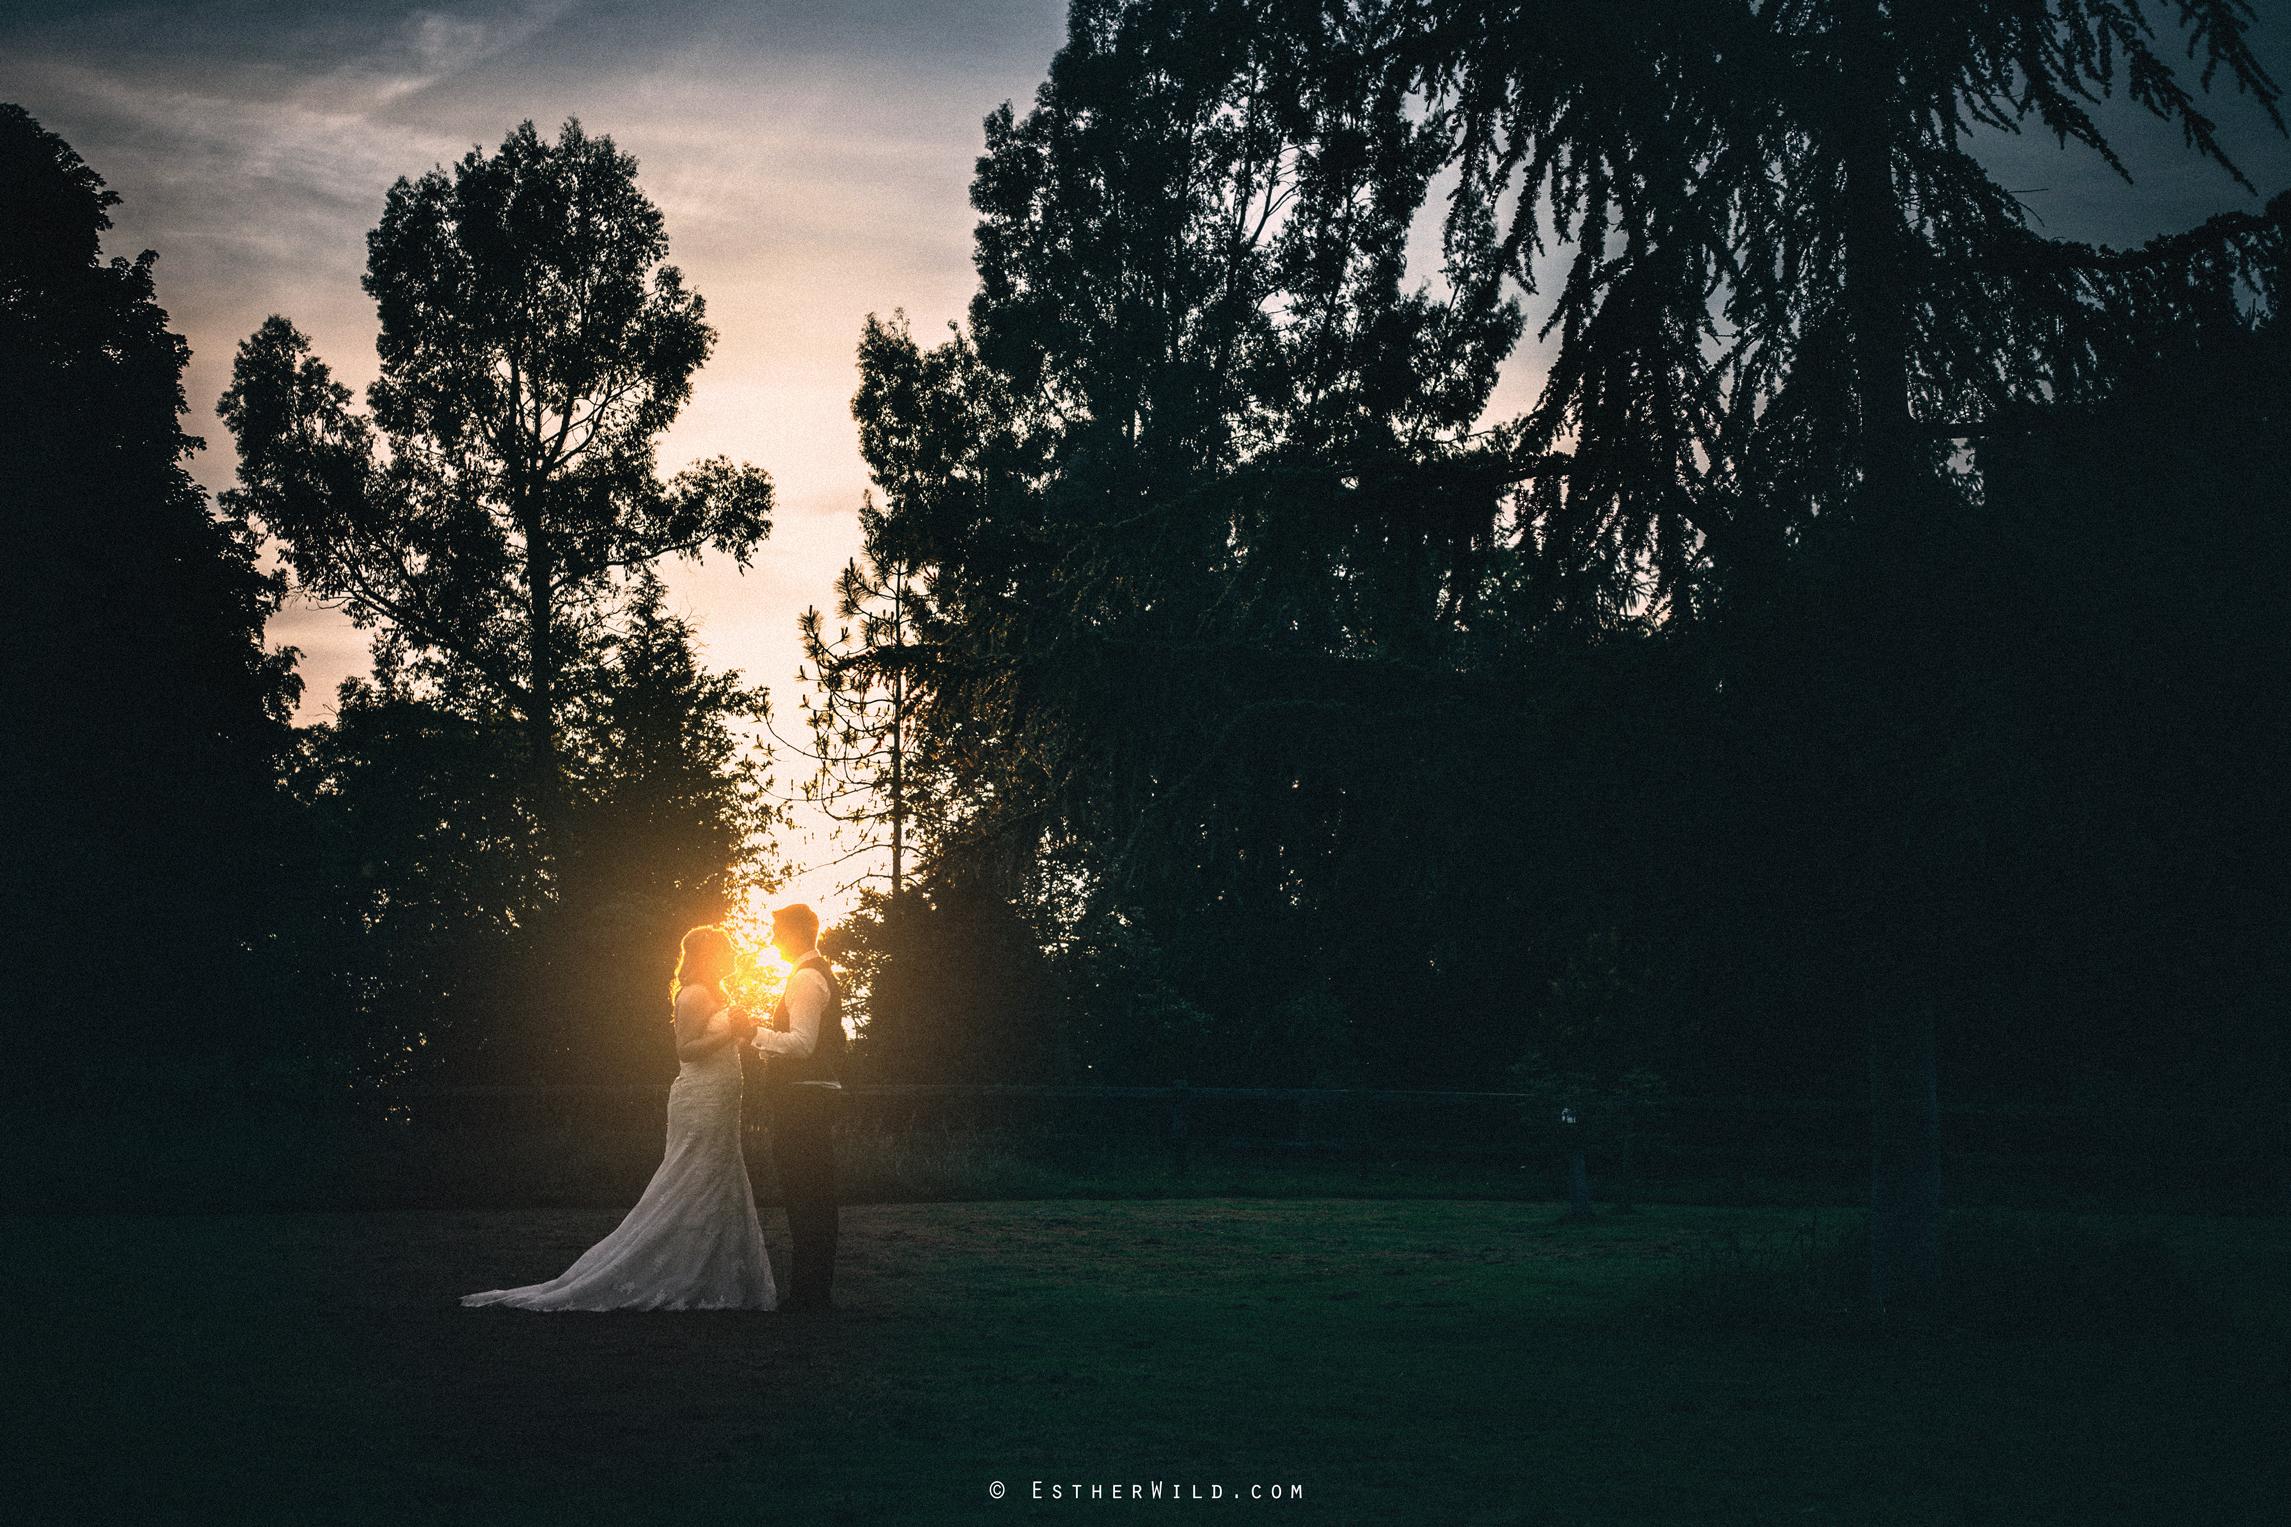 Norfolk_Wedding_Photographer_Mannington_Hall_Country_Esther_Wild_2526-1.jpg